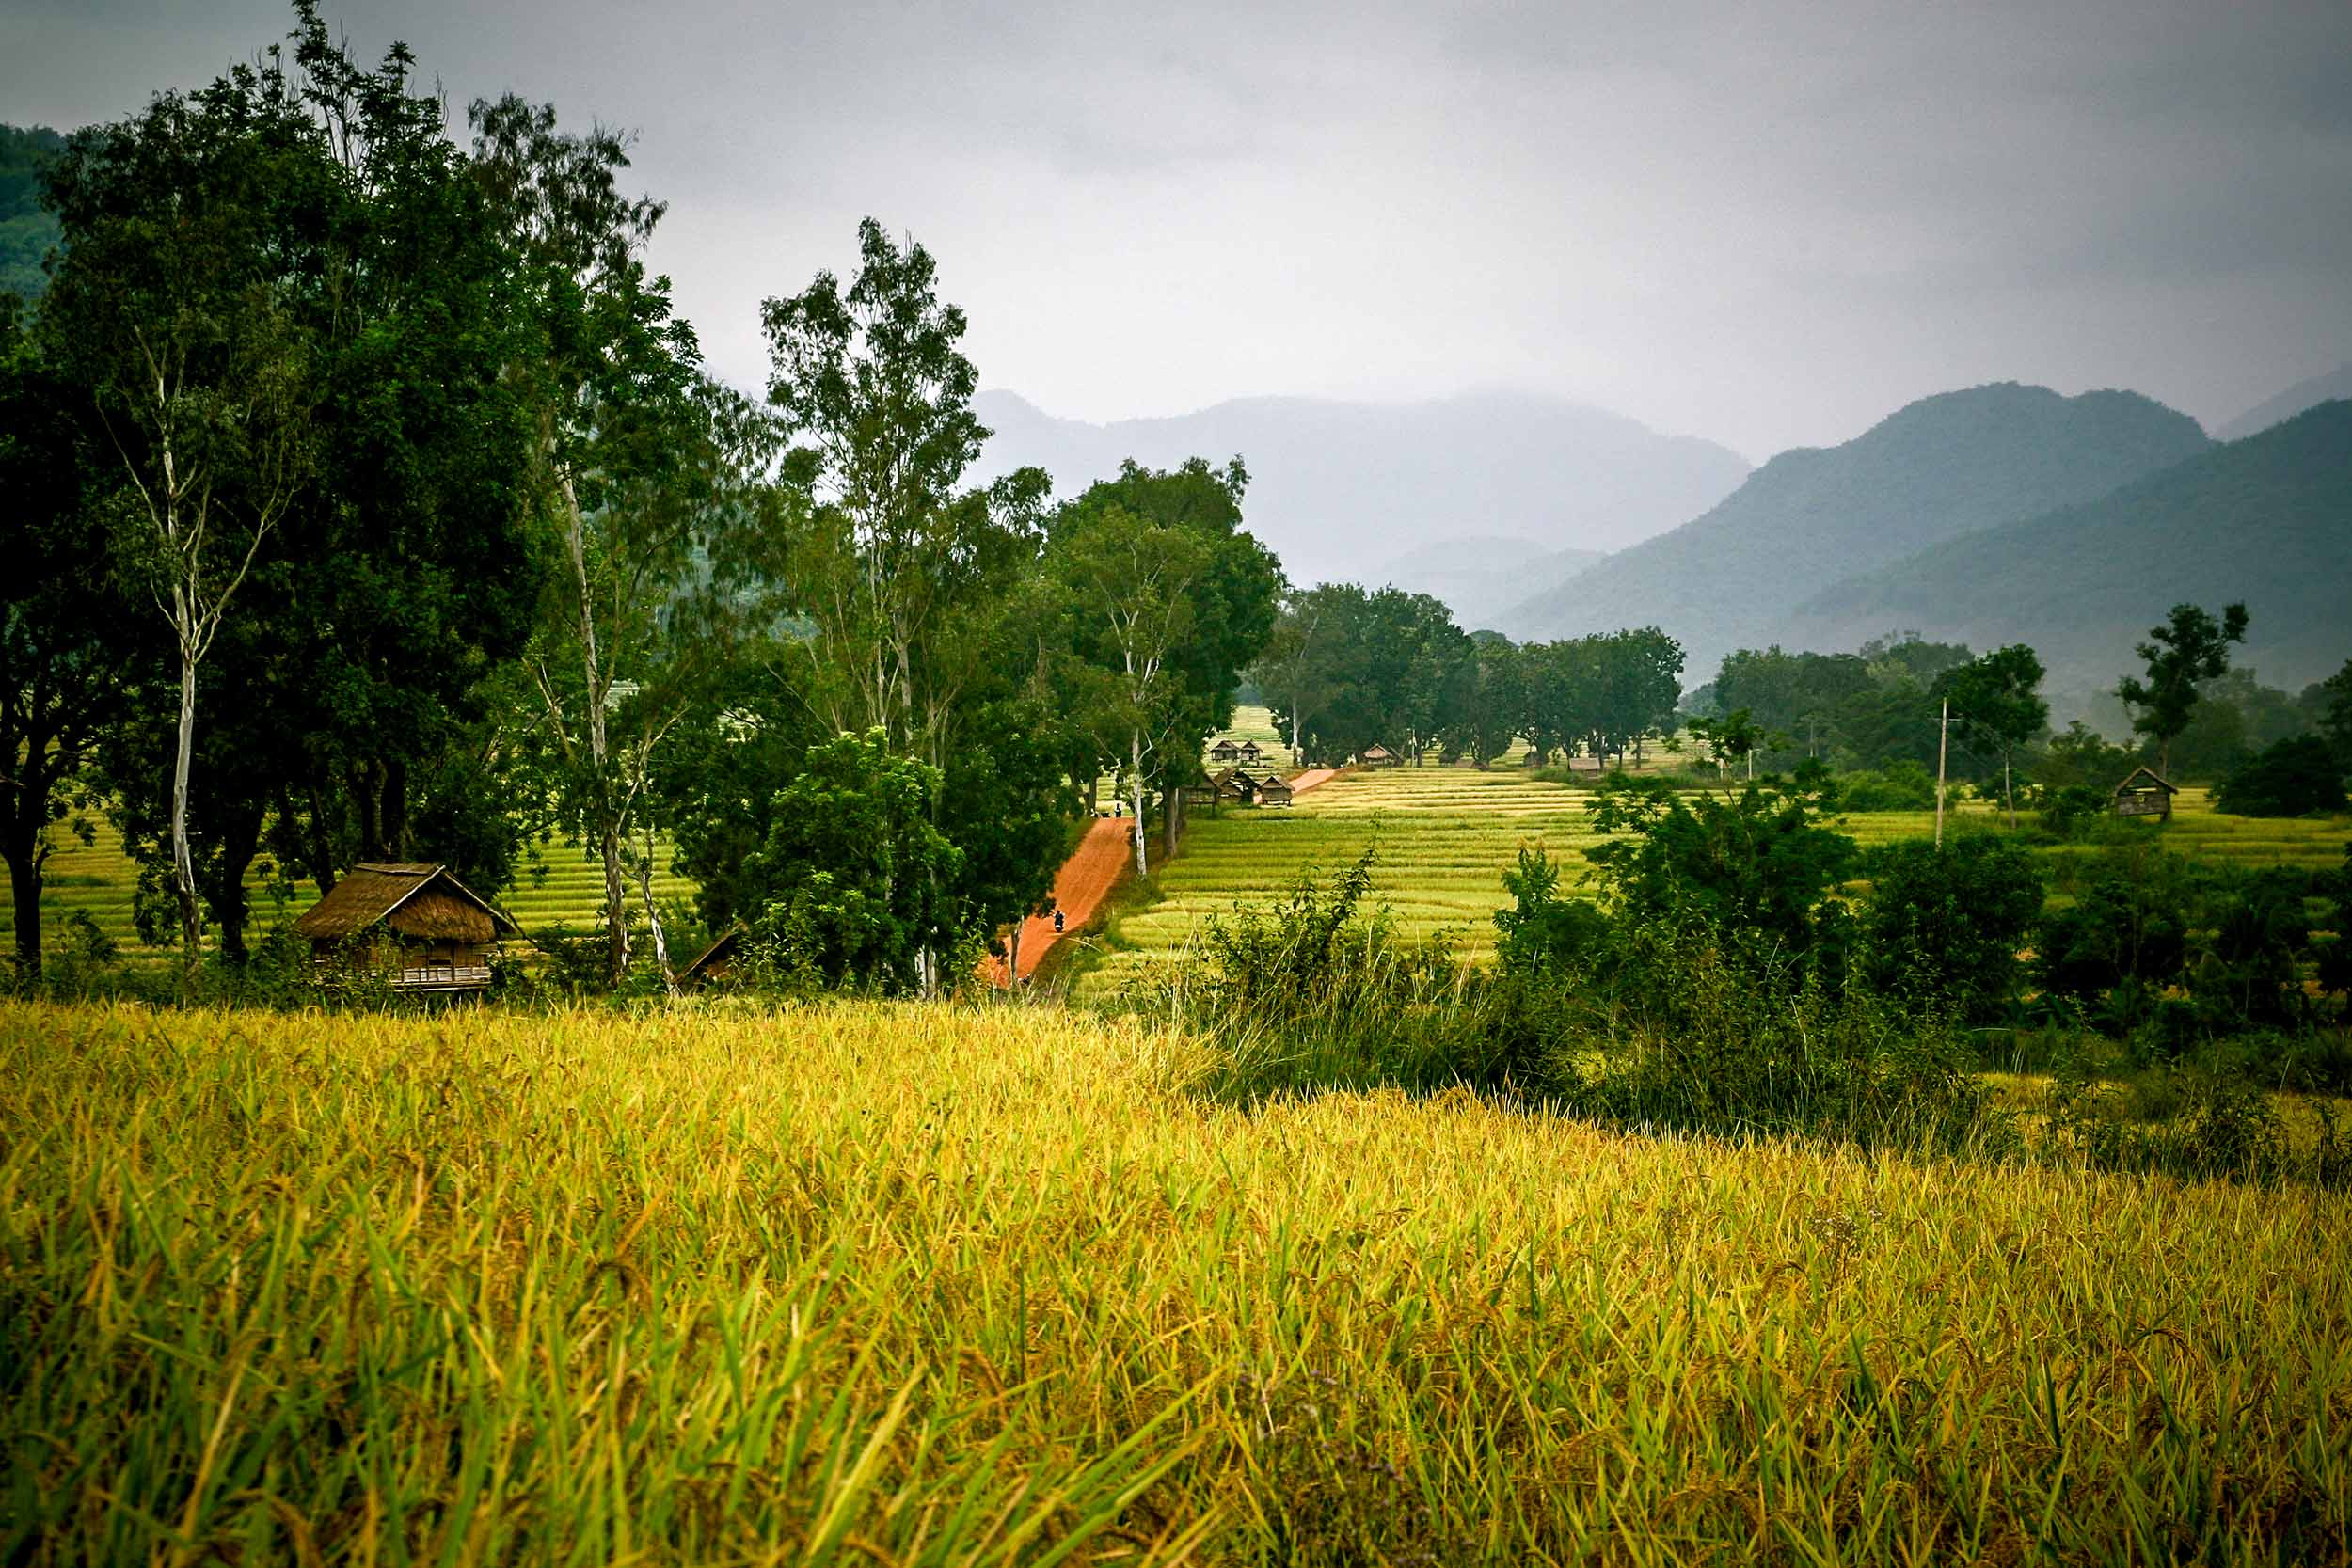 Houhaphan province